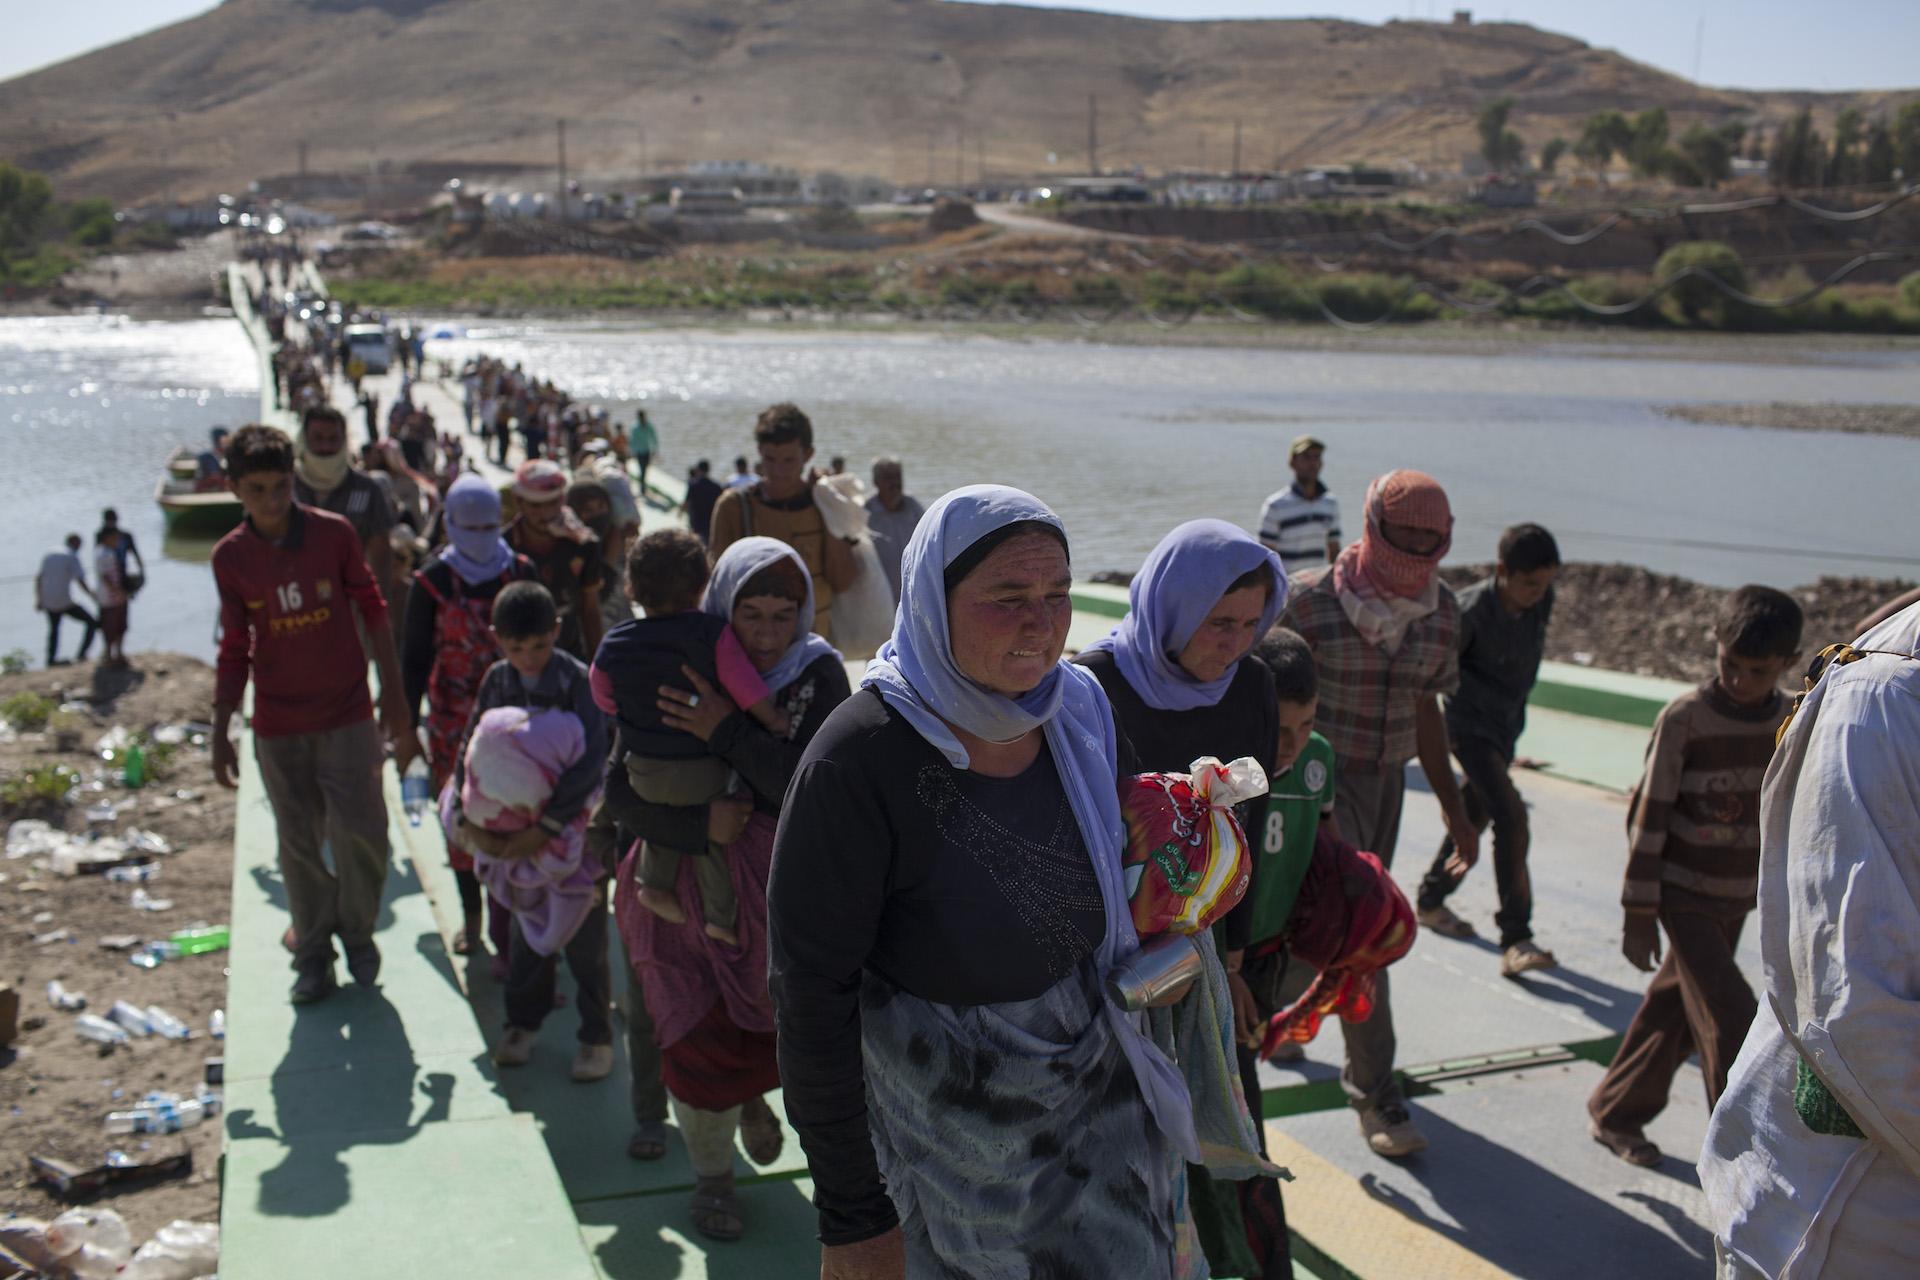 YAZIDI REFUGEES FLEE ISIS